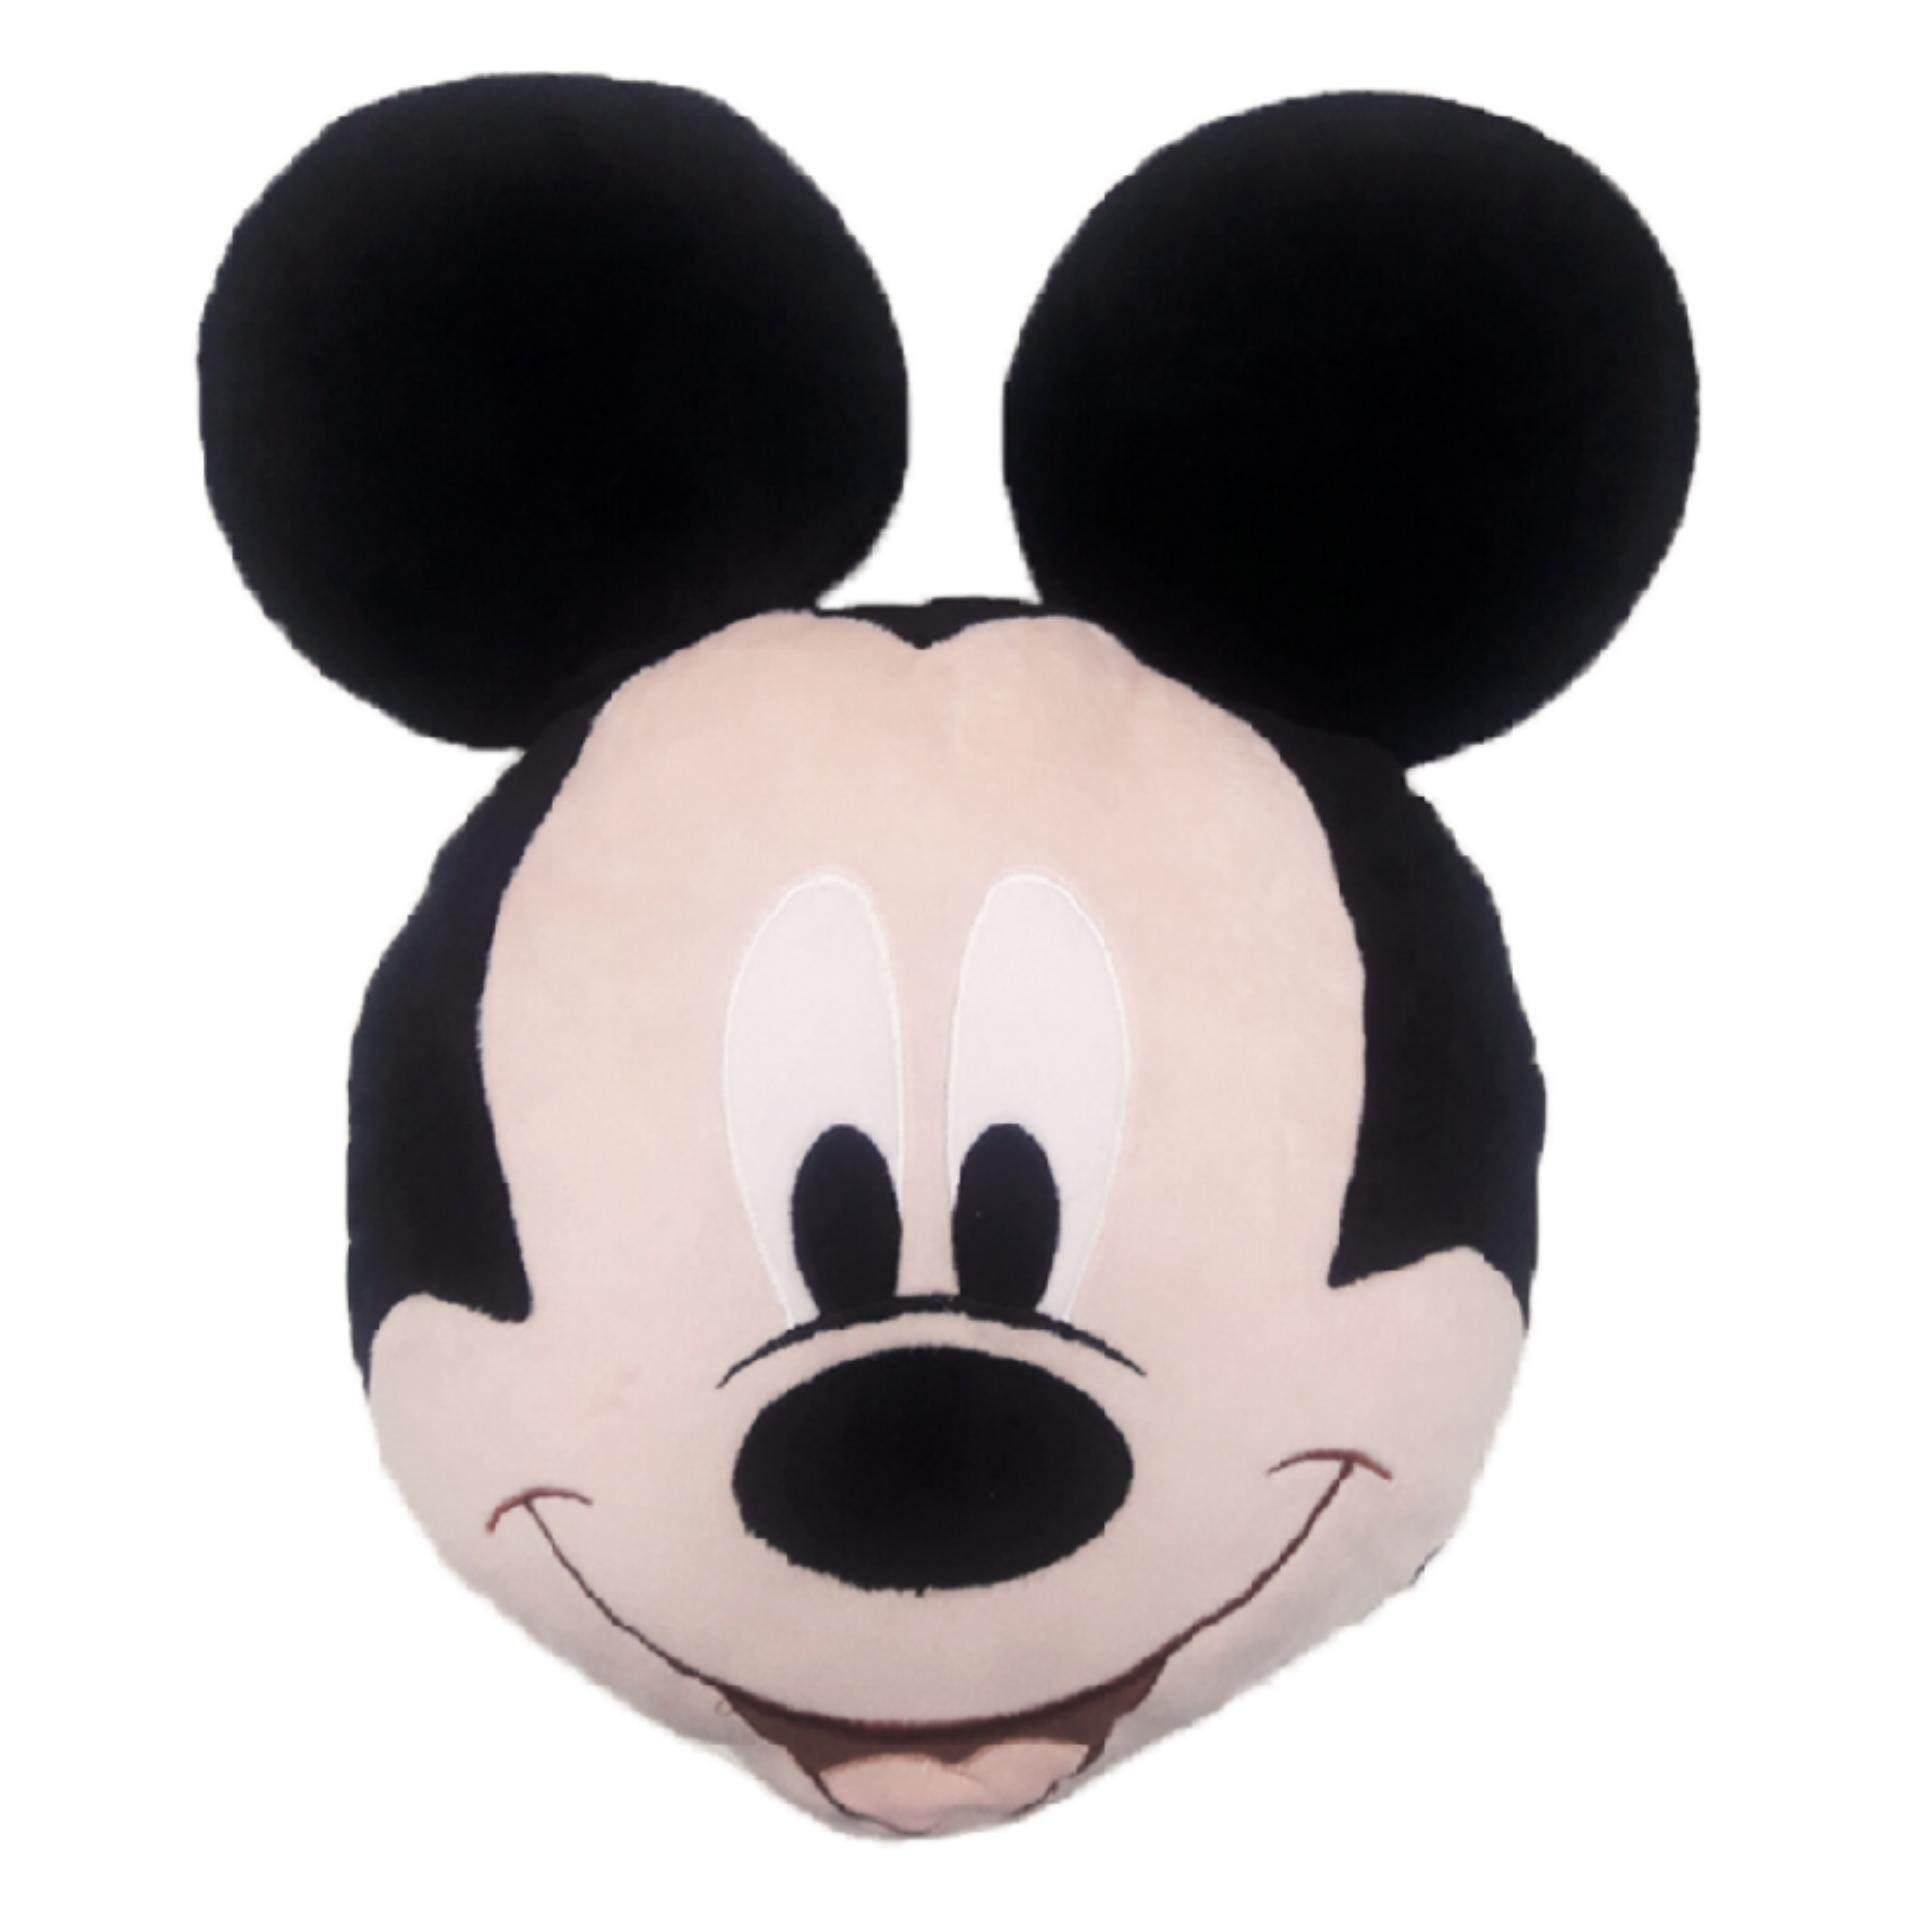 Disney Mickey Face Cushion - Multicolour